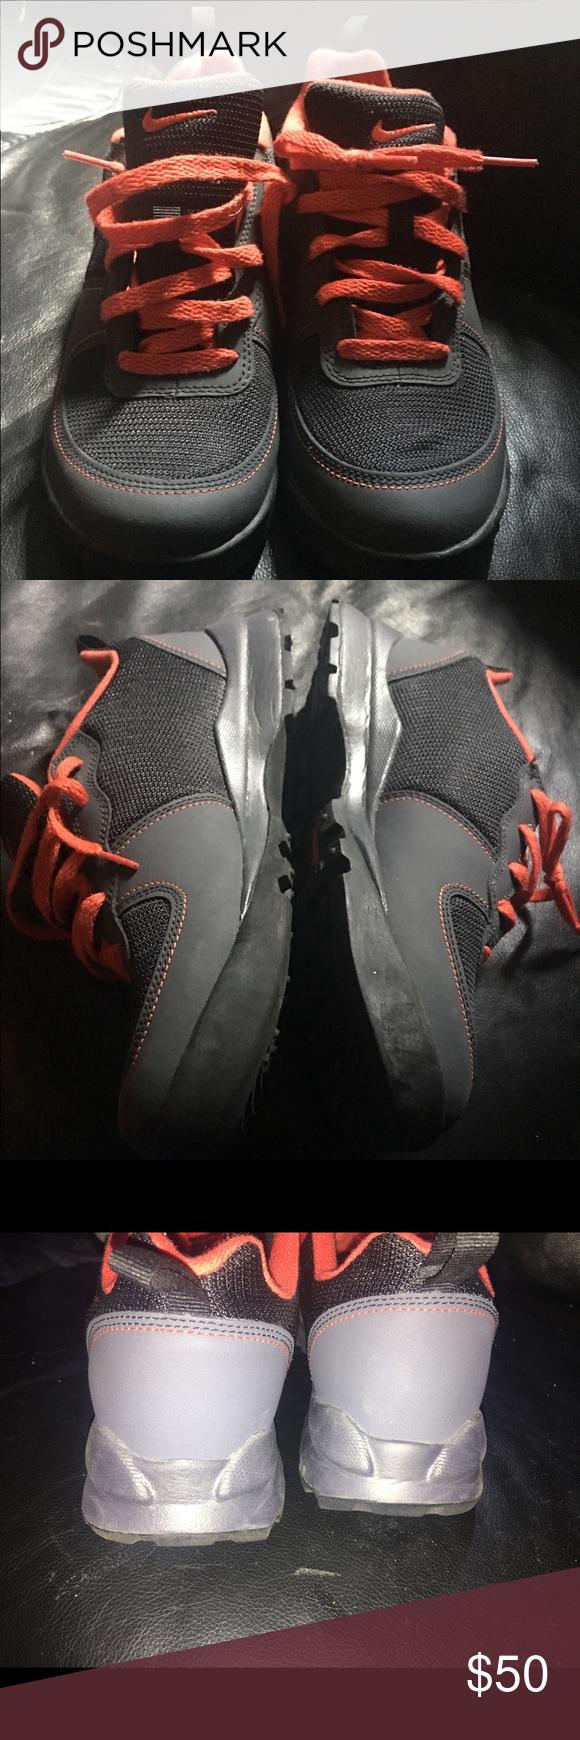 Mens Nike Takos sz 9 worn once Nike air takos sz 9 worn once no box nds Nike Shoes Sneakers